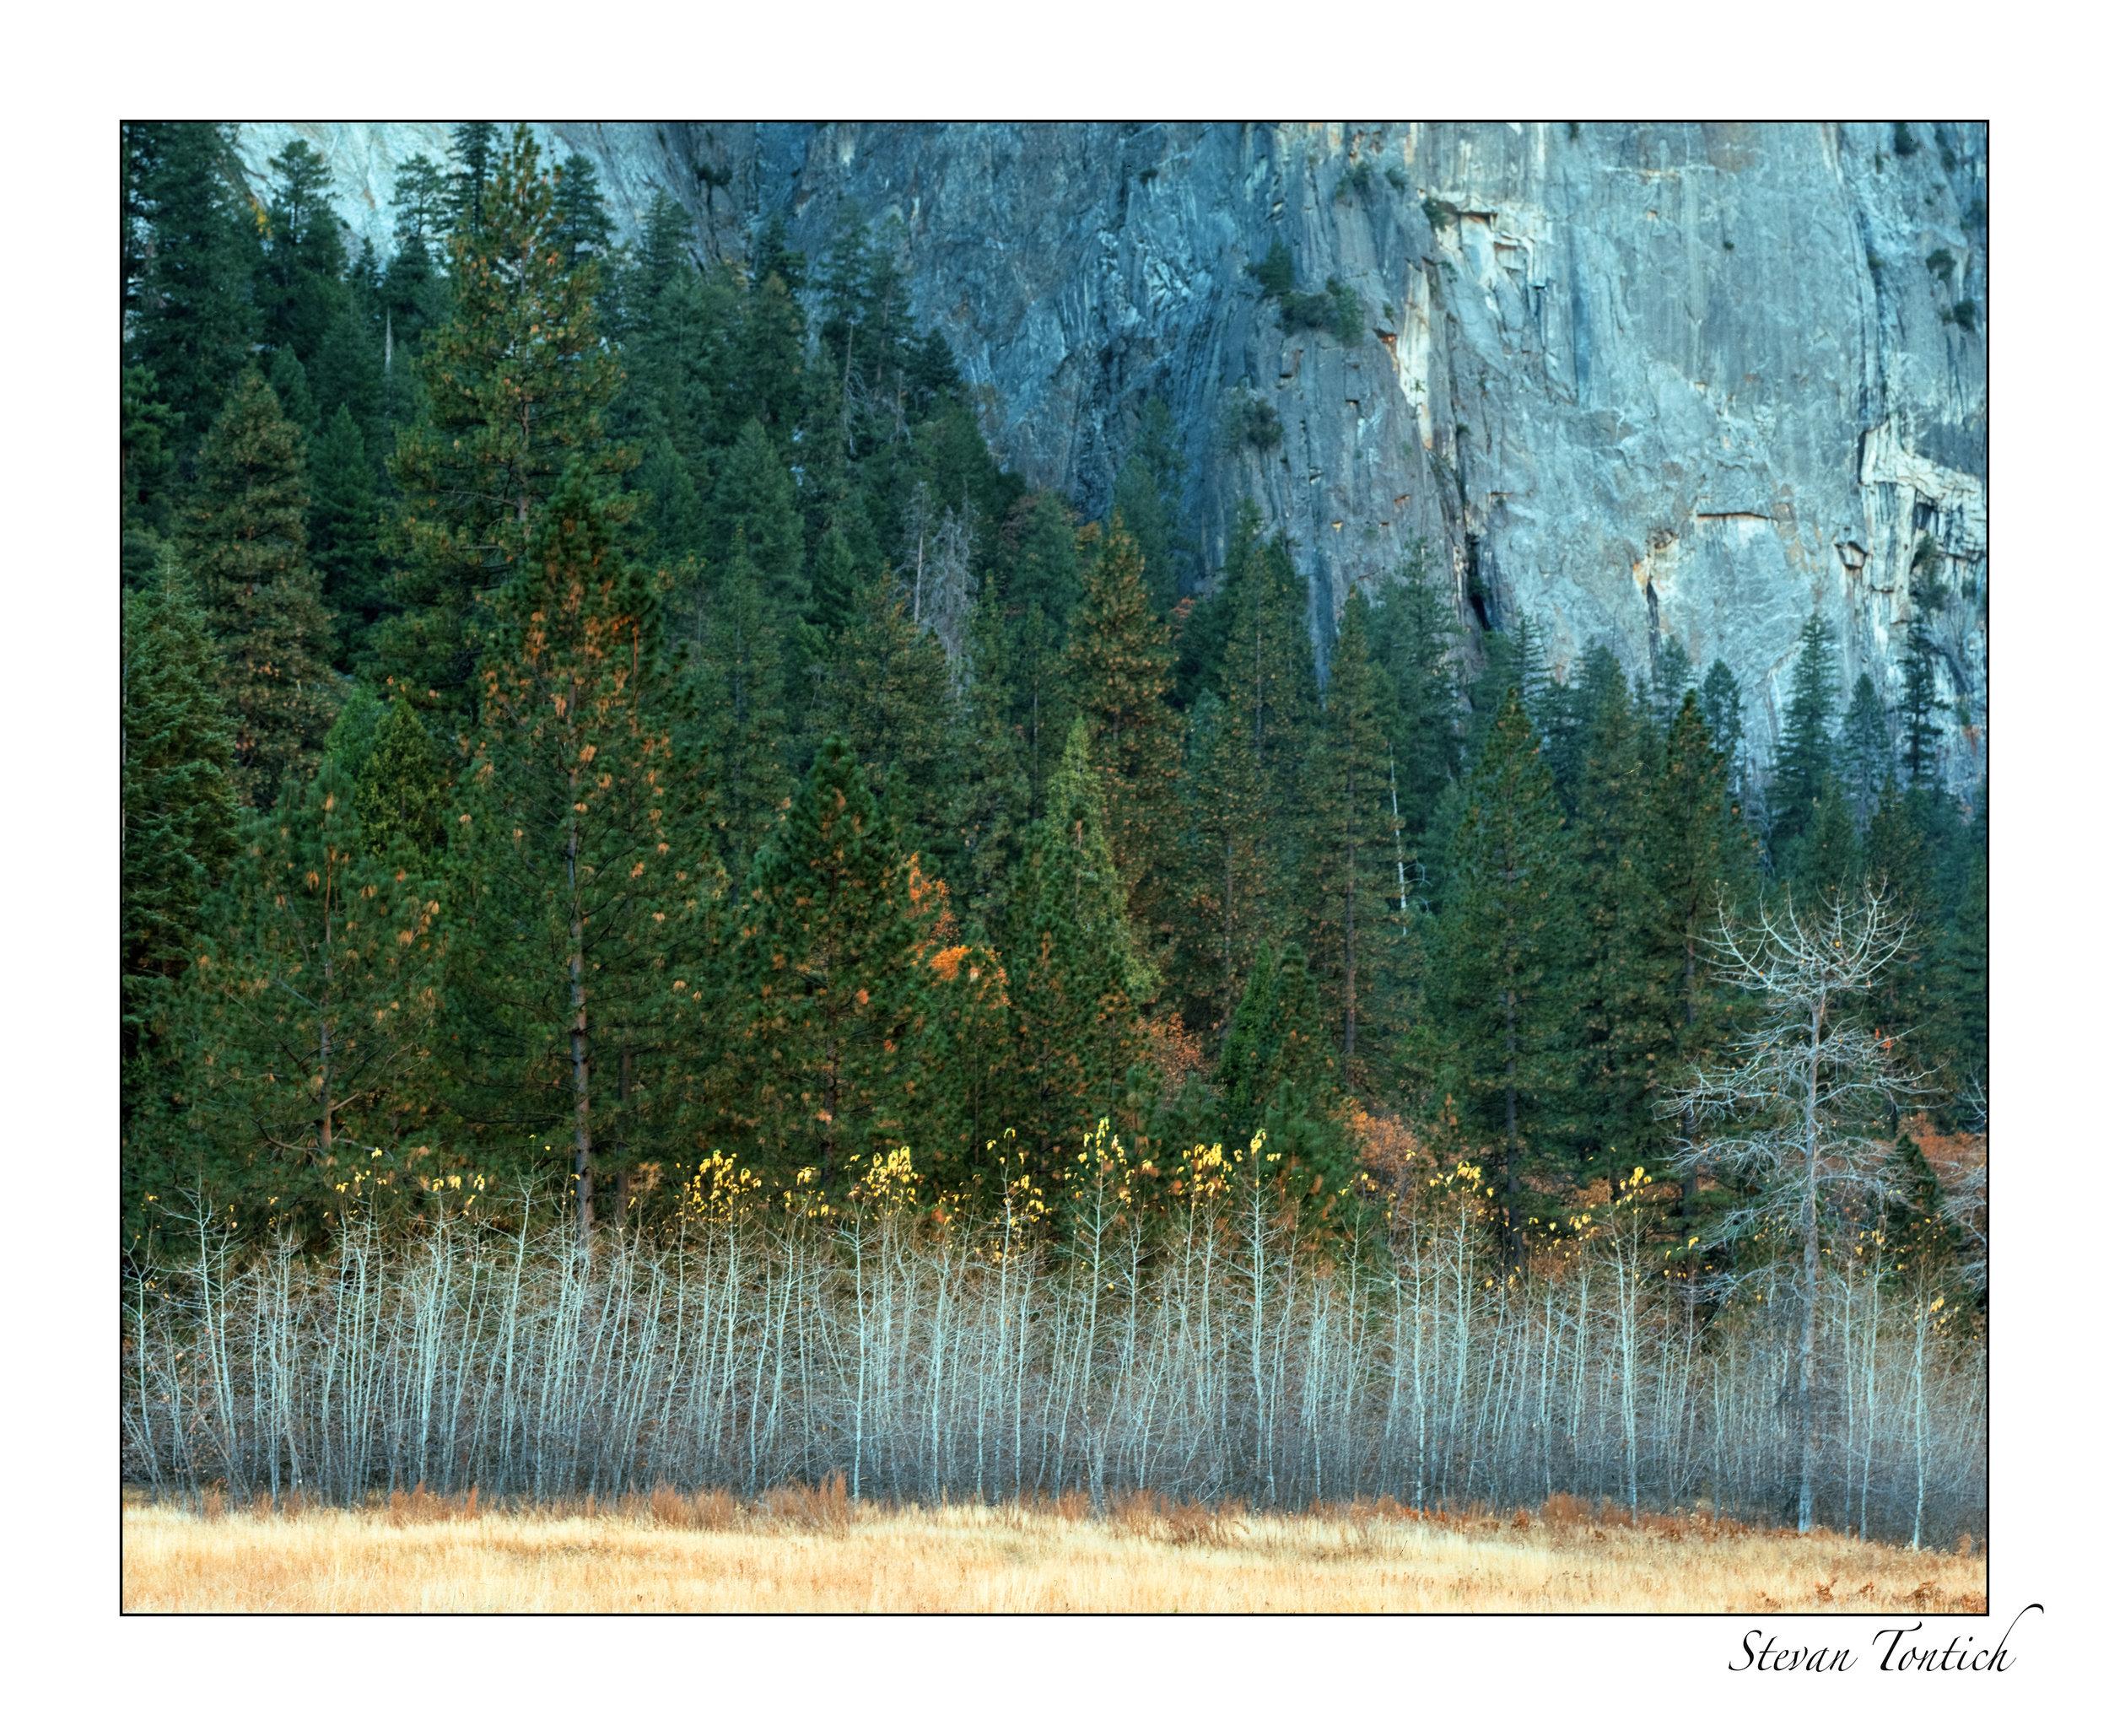 Yosemite cl-0005.jpg